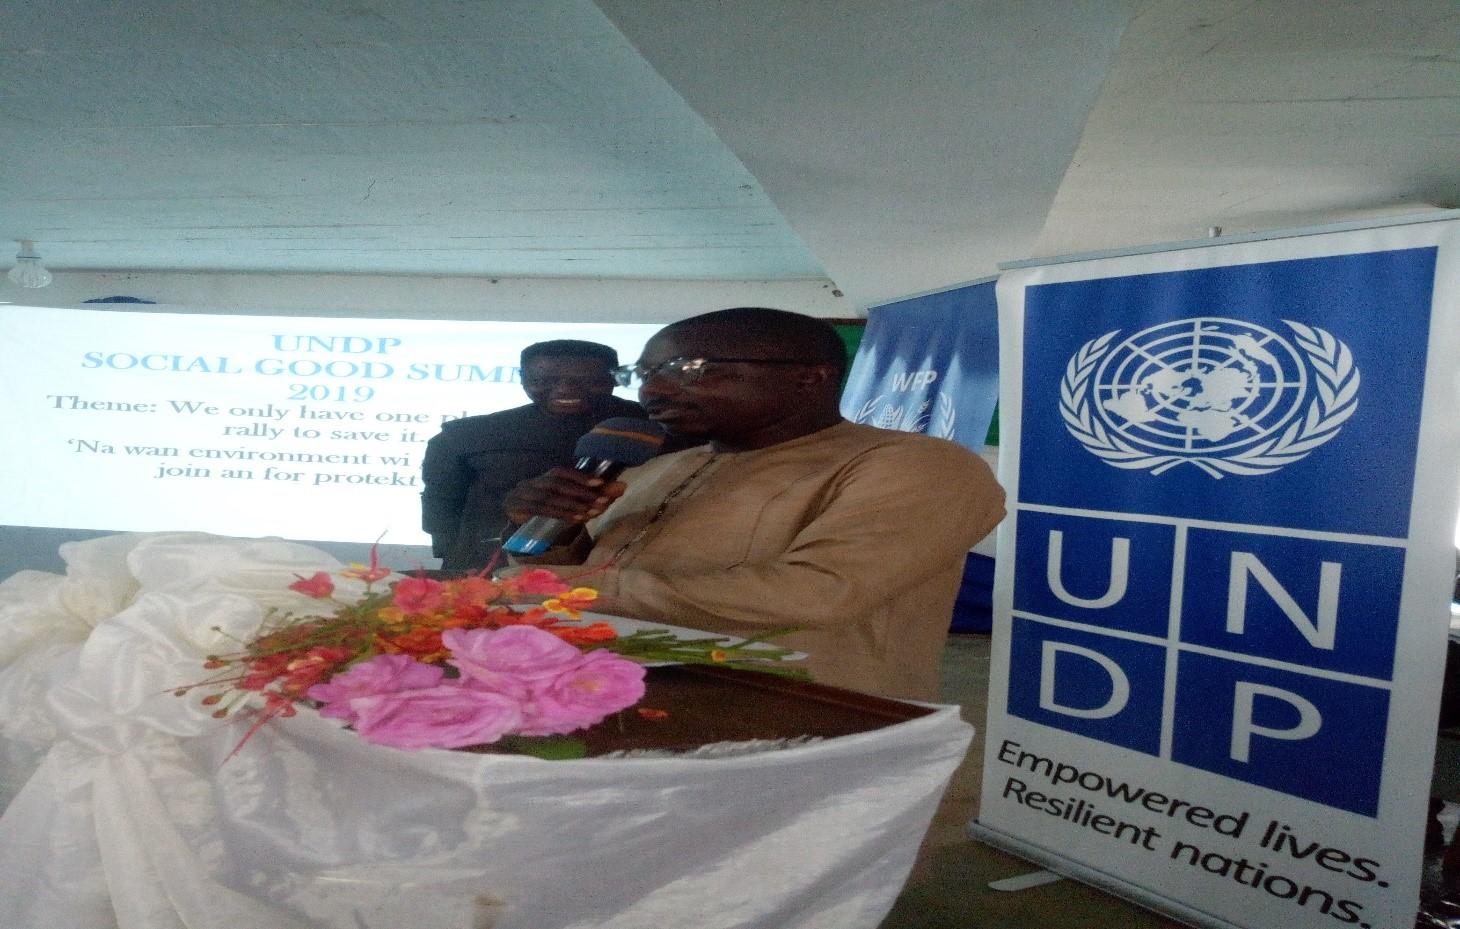 Registrar John Juana speaking at the social Good Summit in Kenema